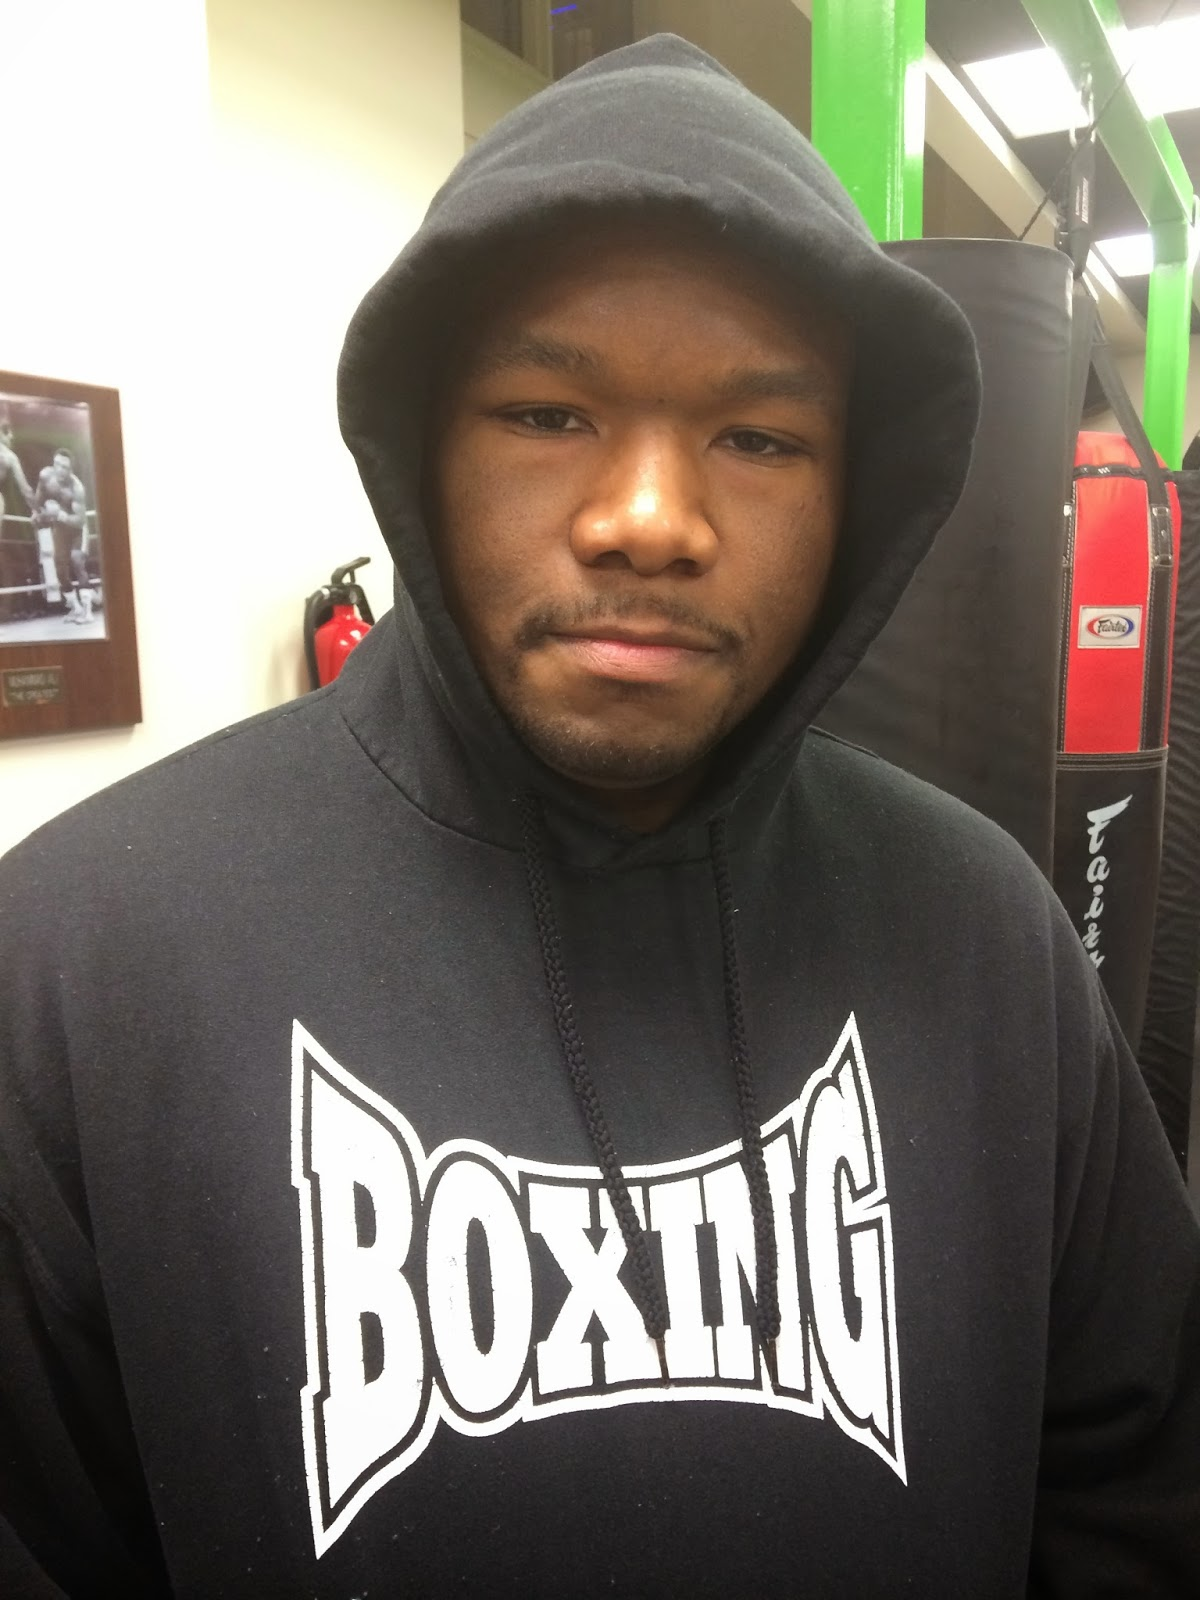 MMA in the DMV: DCBFIT - Michael Parker